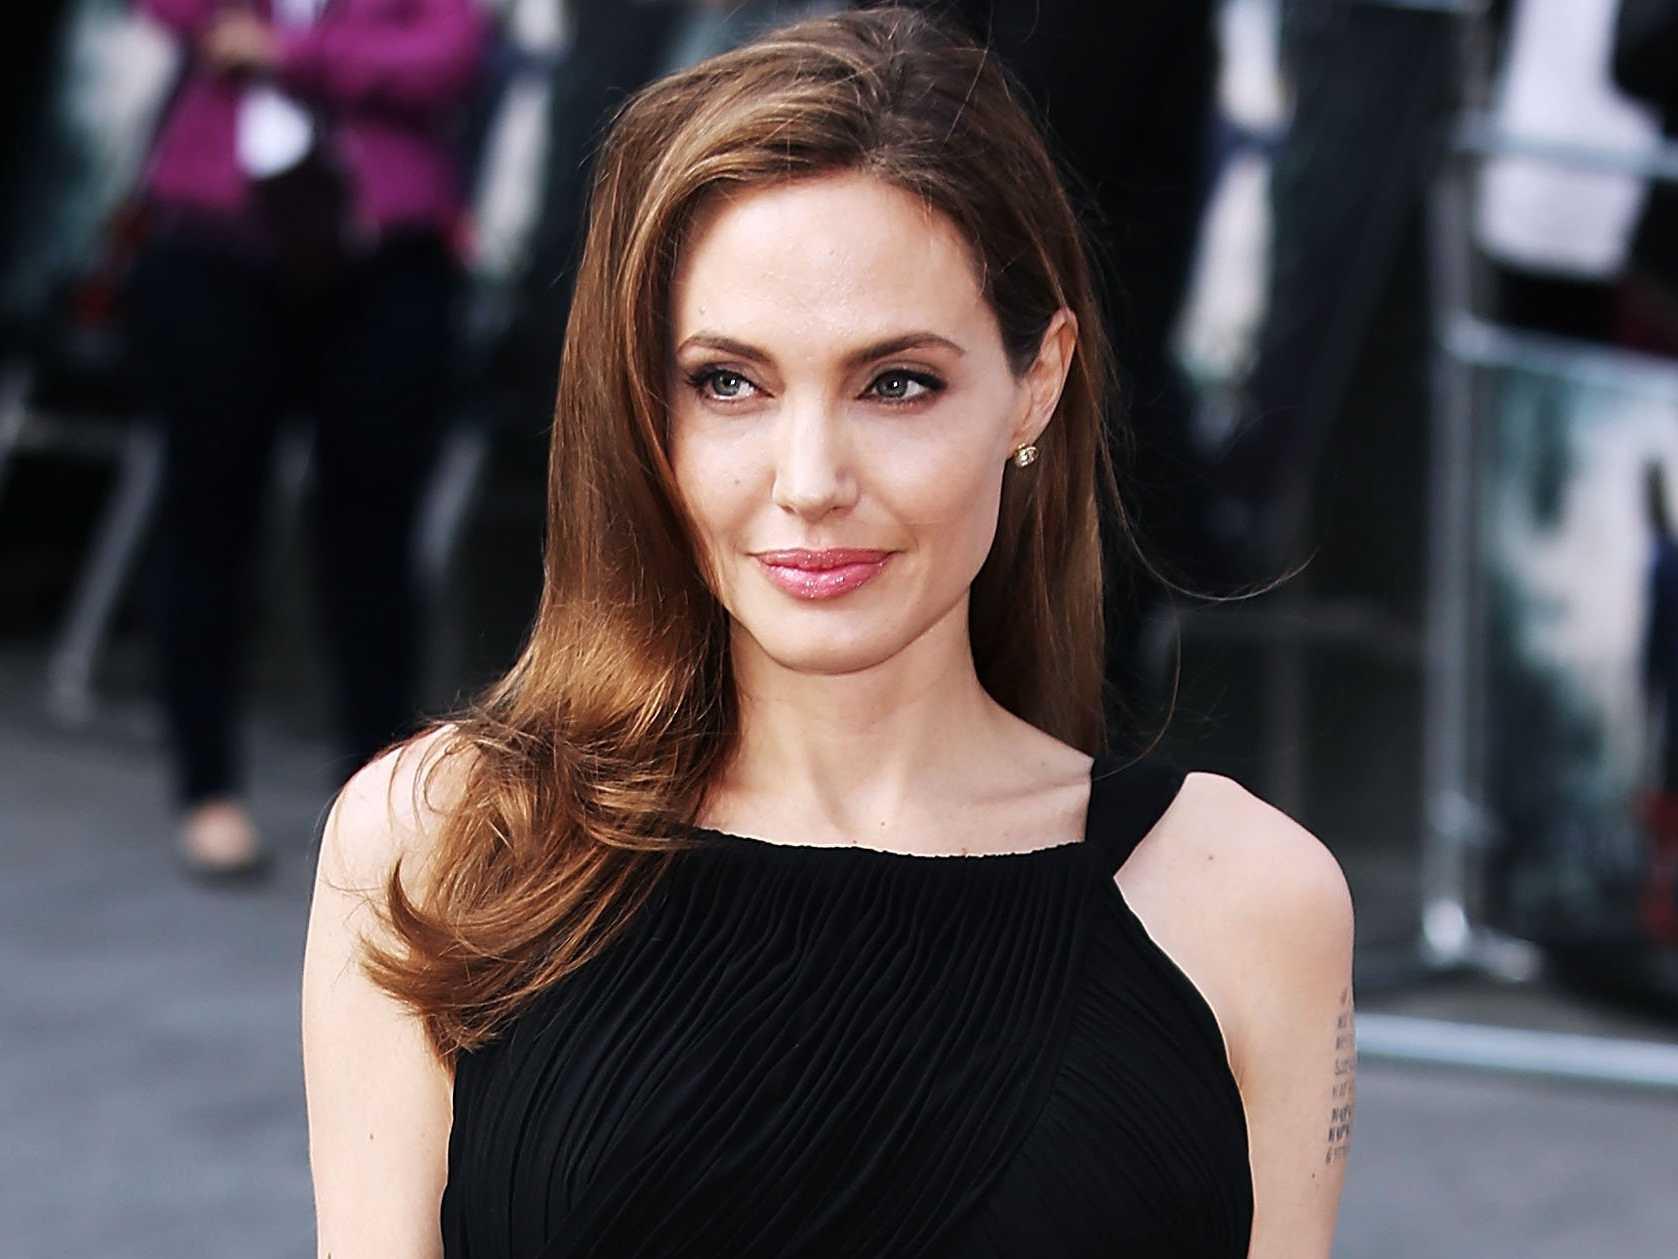 Jolie was named a UNHCR Angelina Jolie